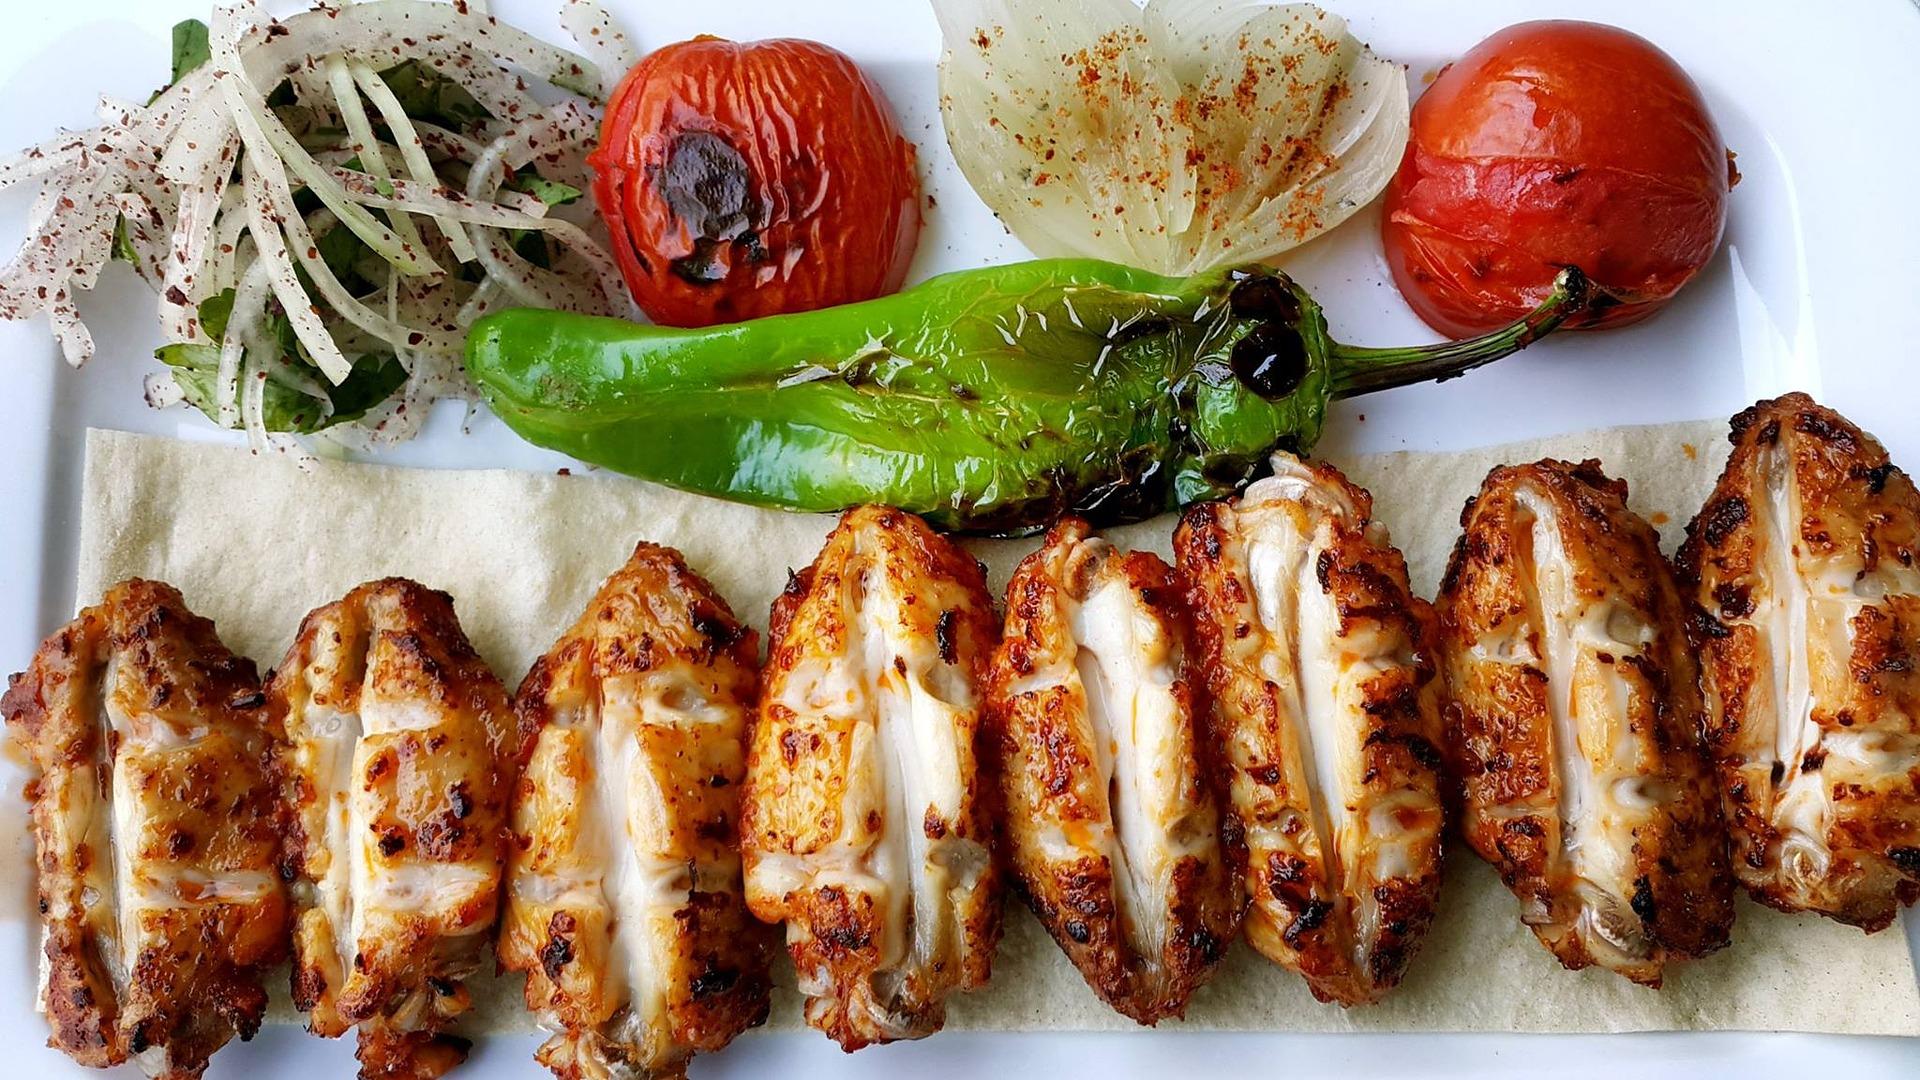 An image of kebab wa kafta